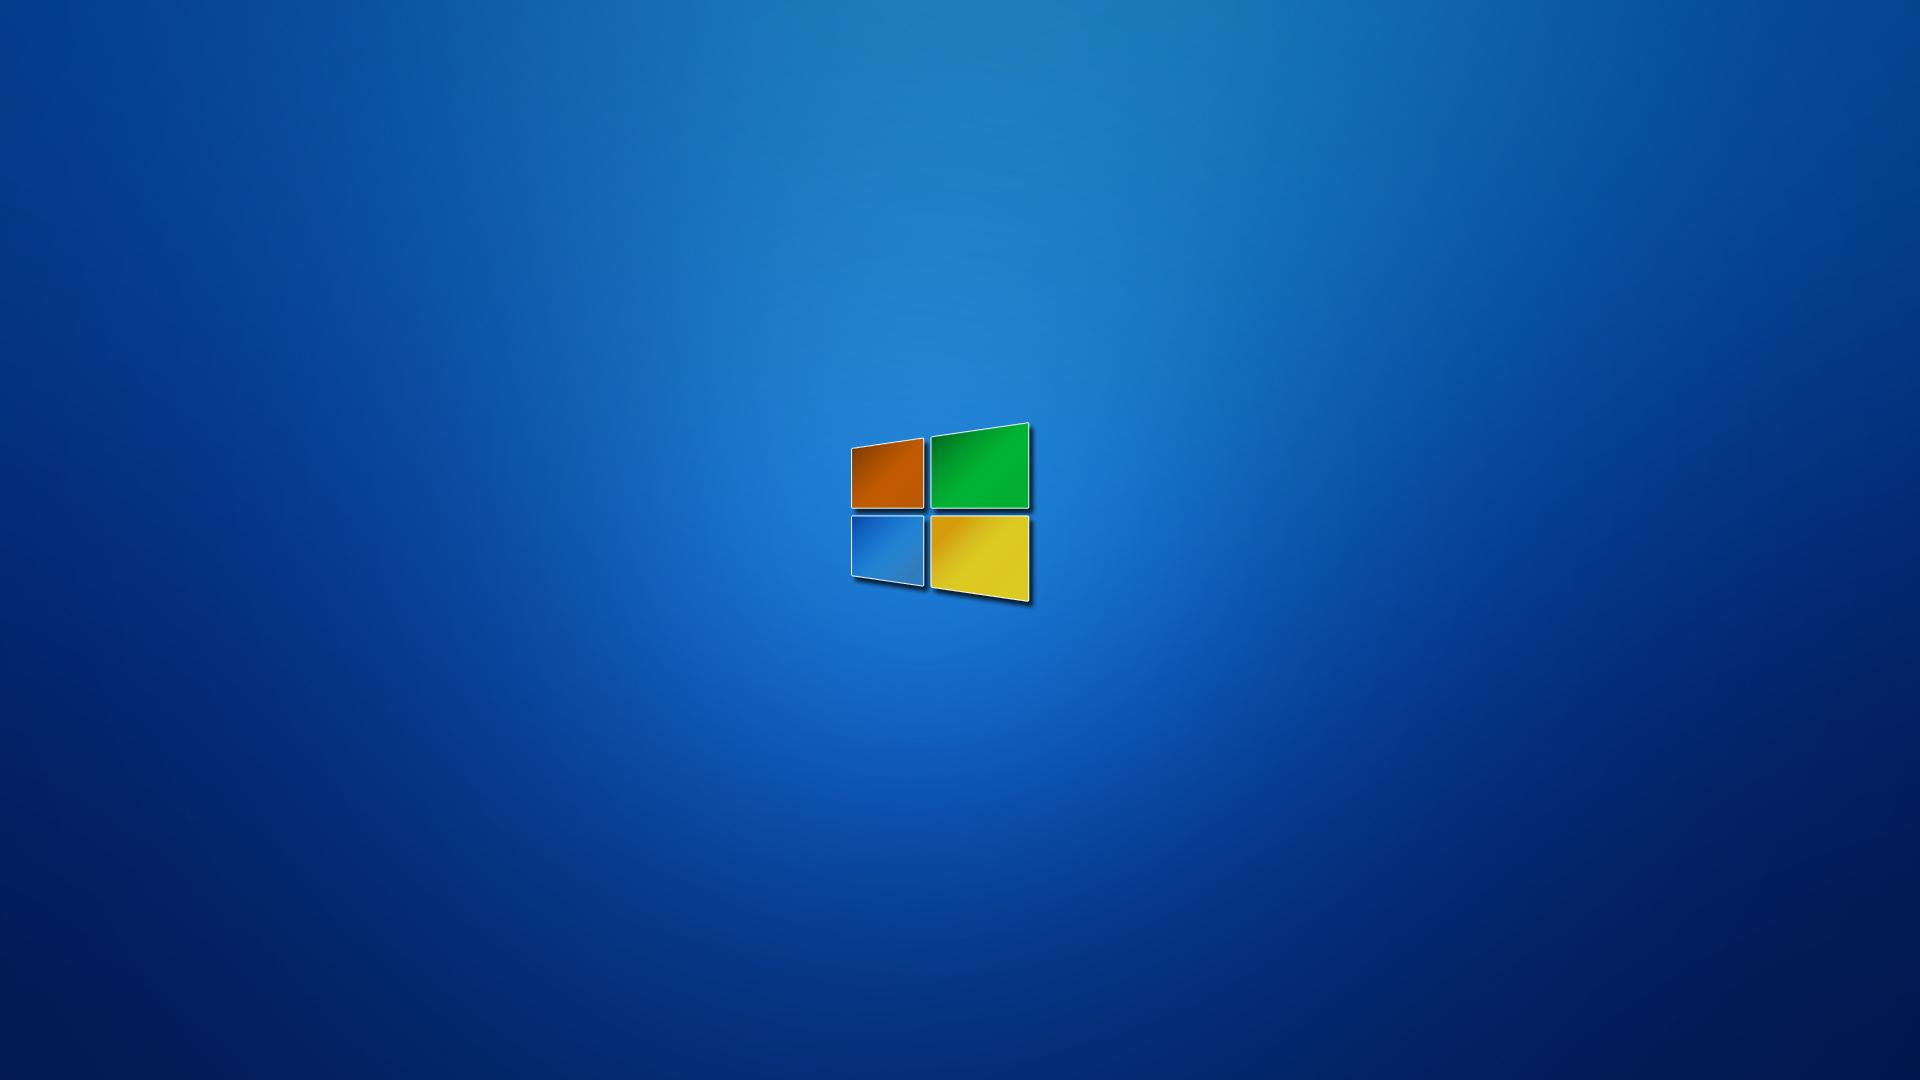 Windows Wallpaper Images Background 13142   ARASPOTcom 1920x1080